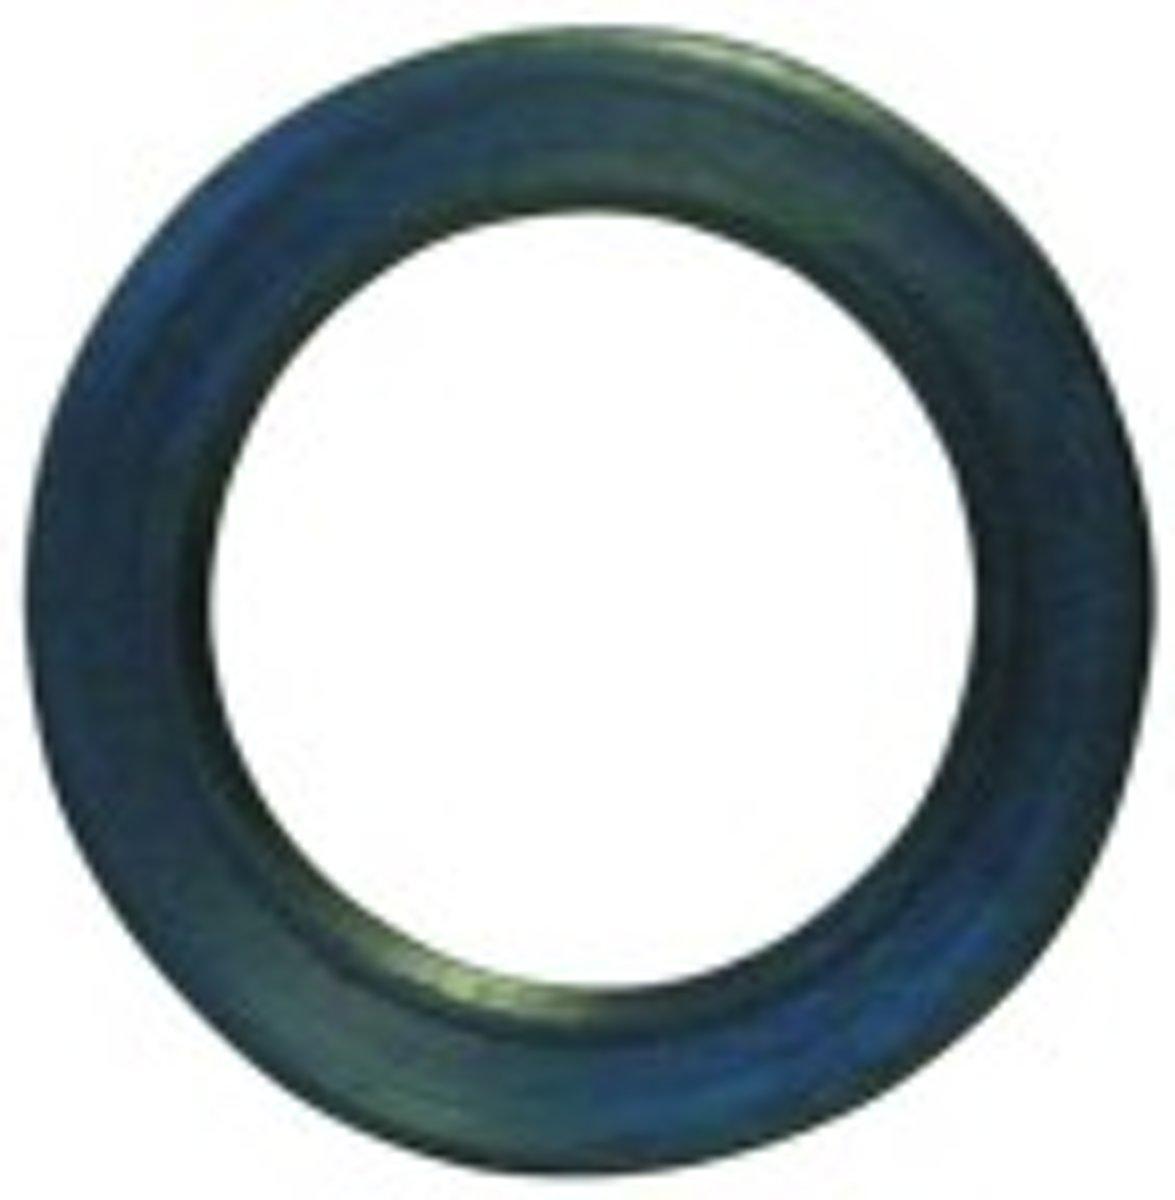 Reduceerring 30x16x2.0mm tbv cirkelzaagblad